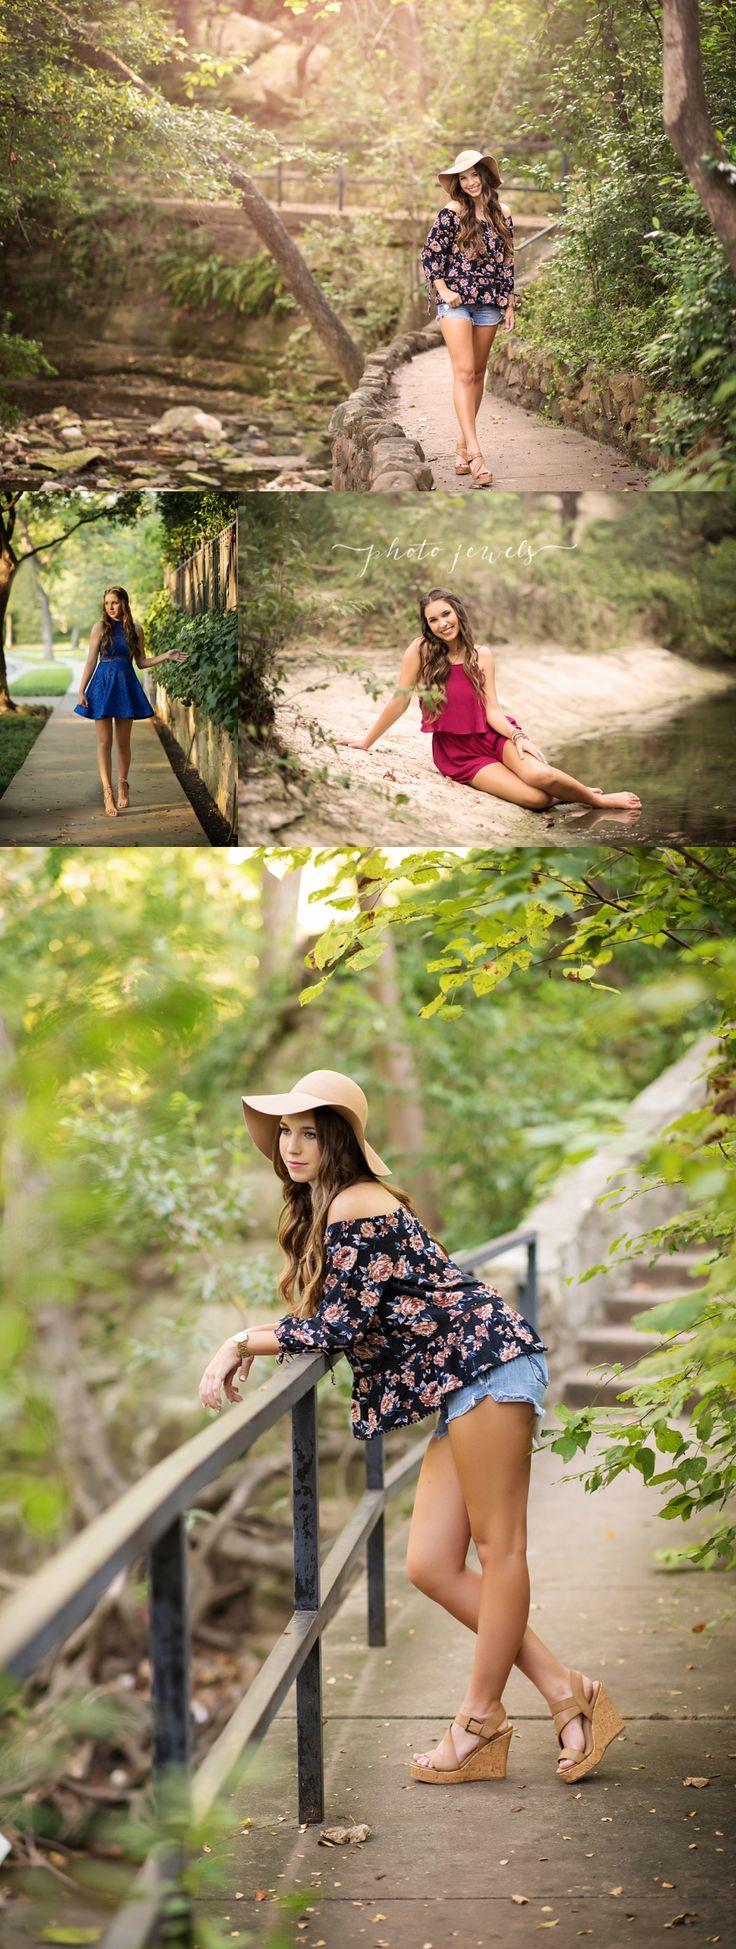 senior girl, senior pic ideas, floppy hat, creek, water, senior shoot park, photo jewels rockwall